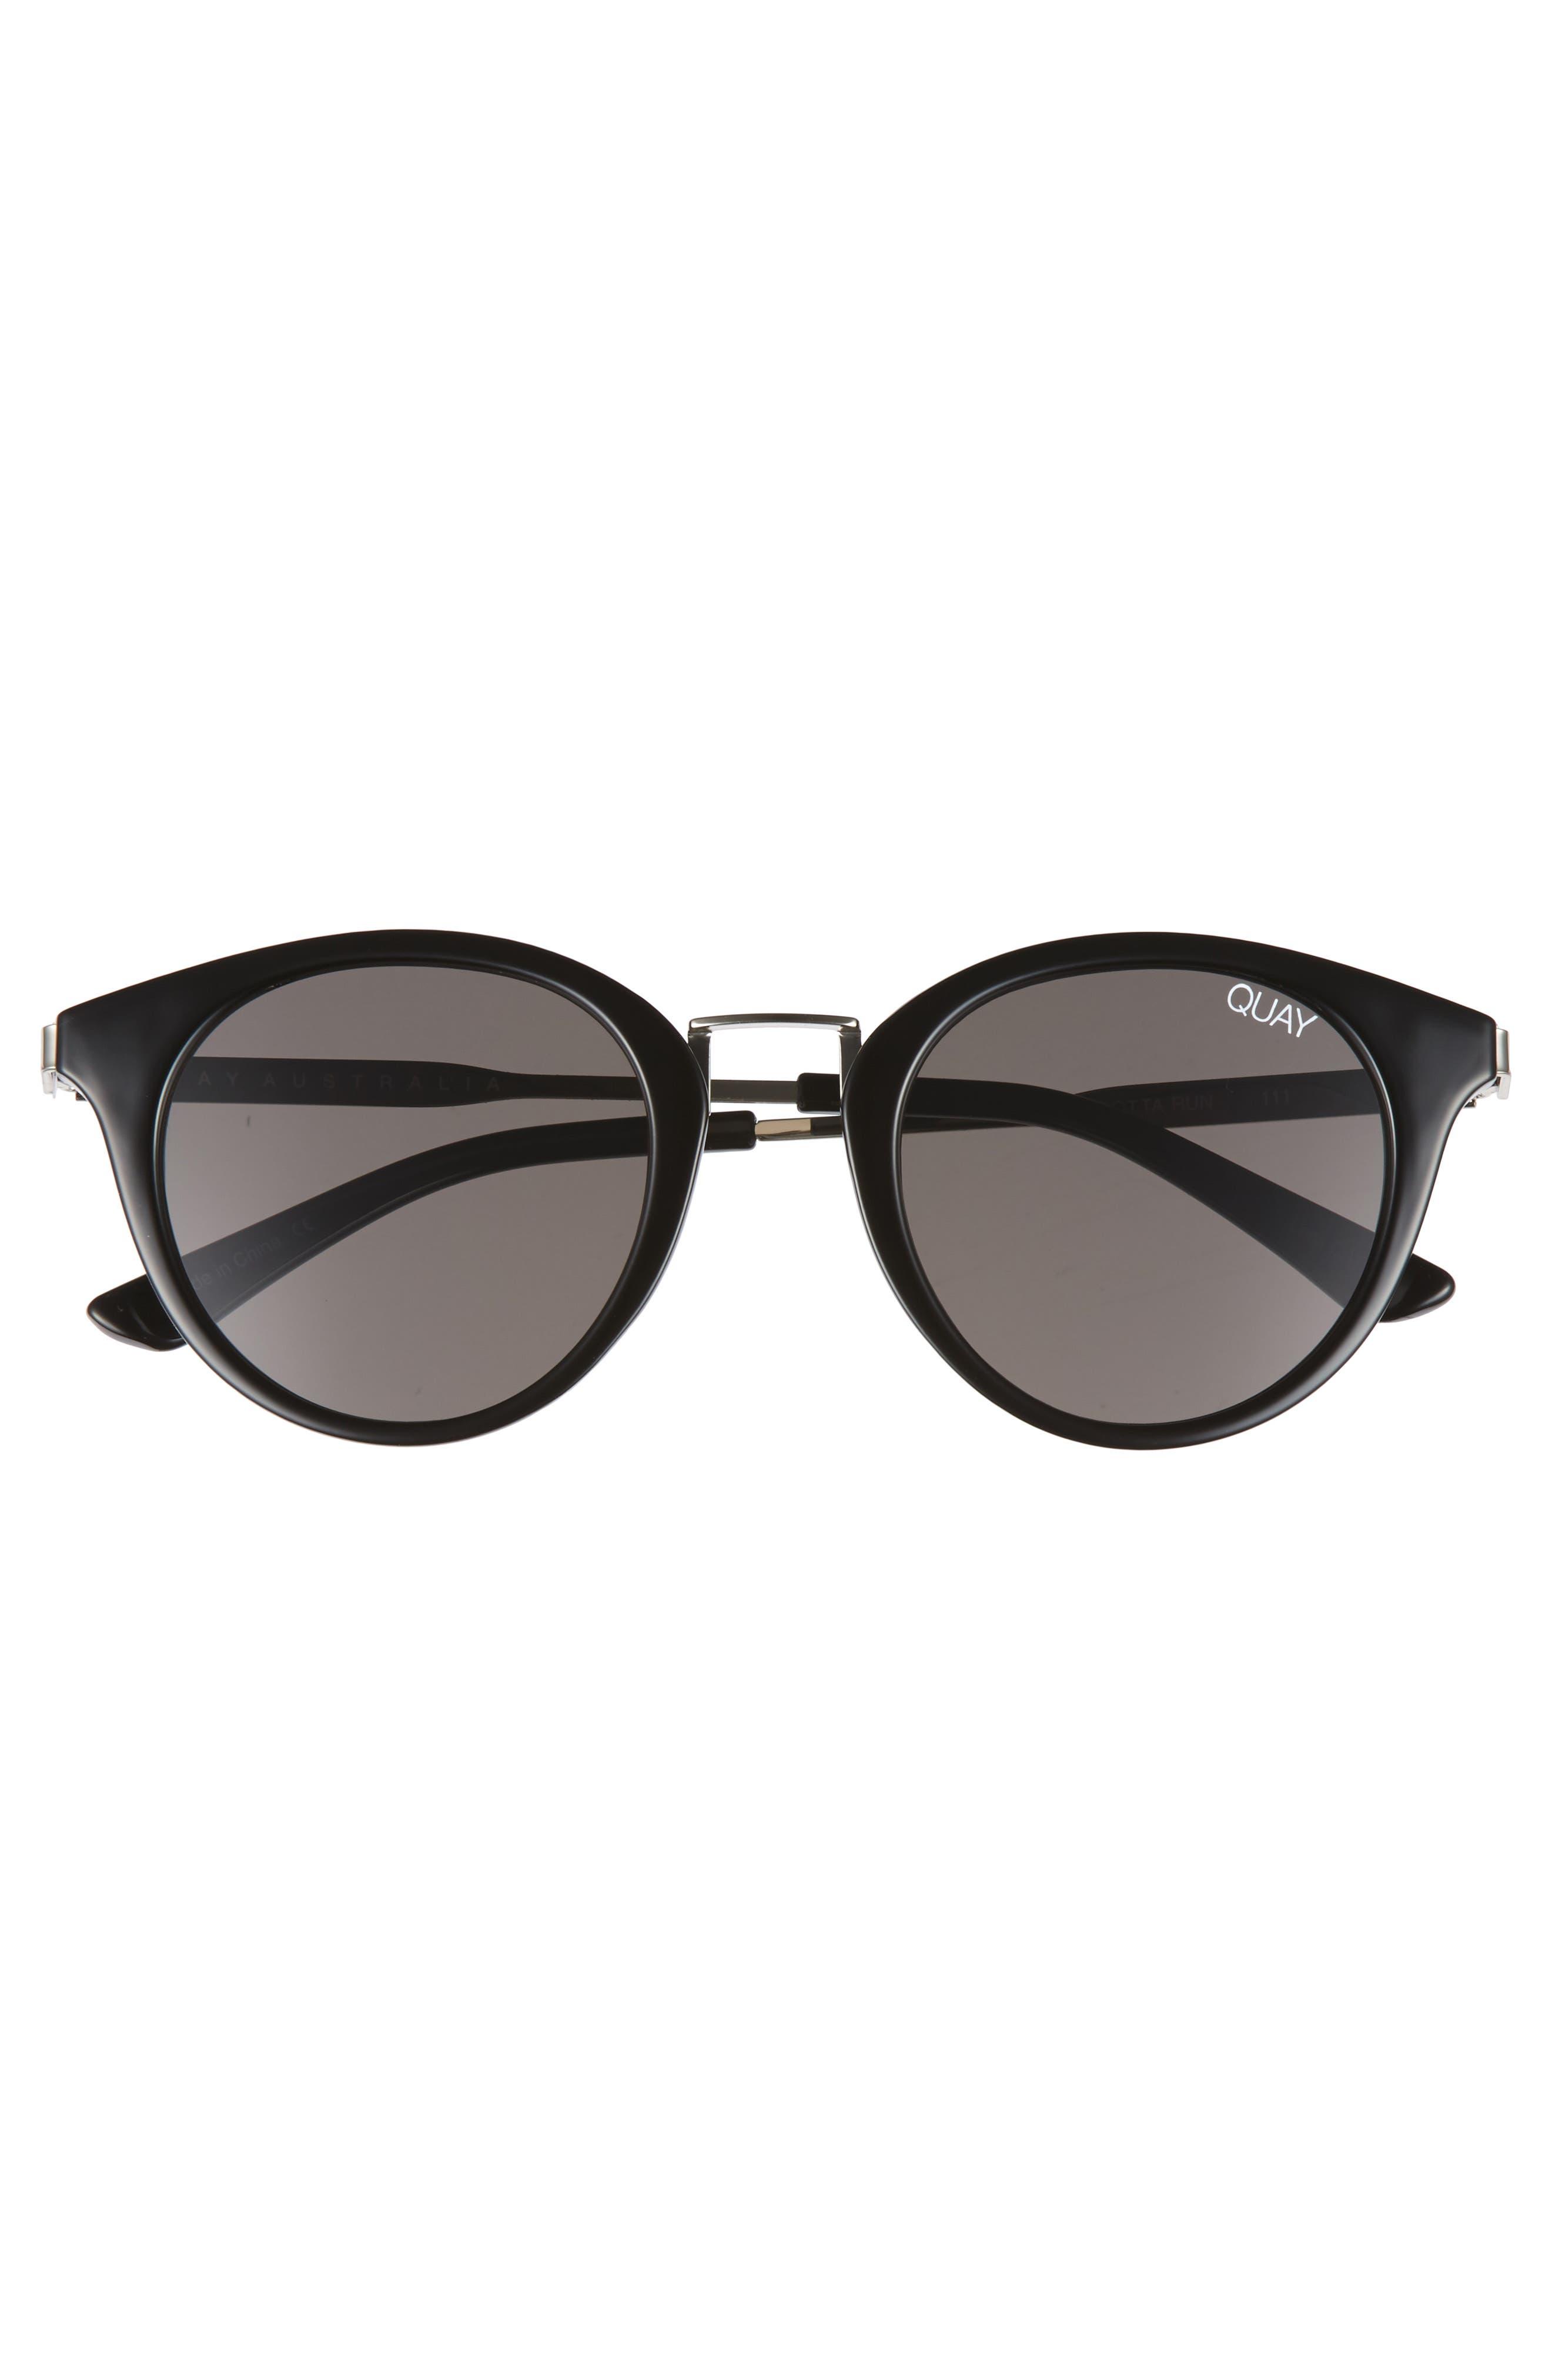 Gotta Run 48mm Sunglasses,                             Alternate thumbnail 3, color,                             001